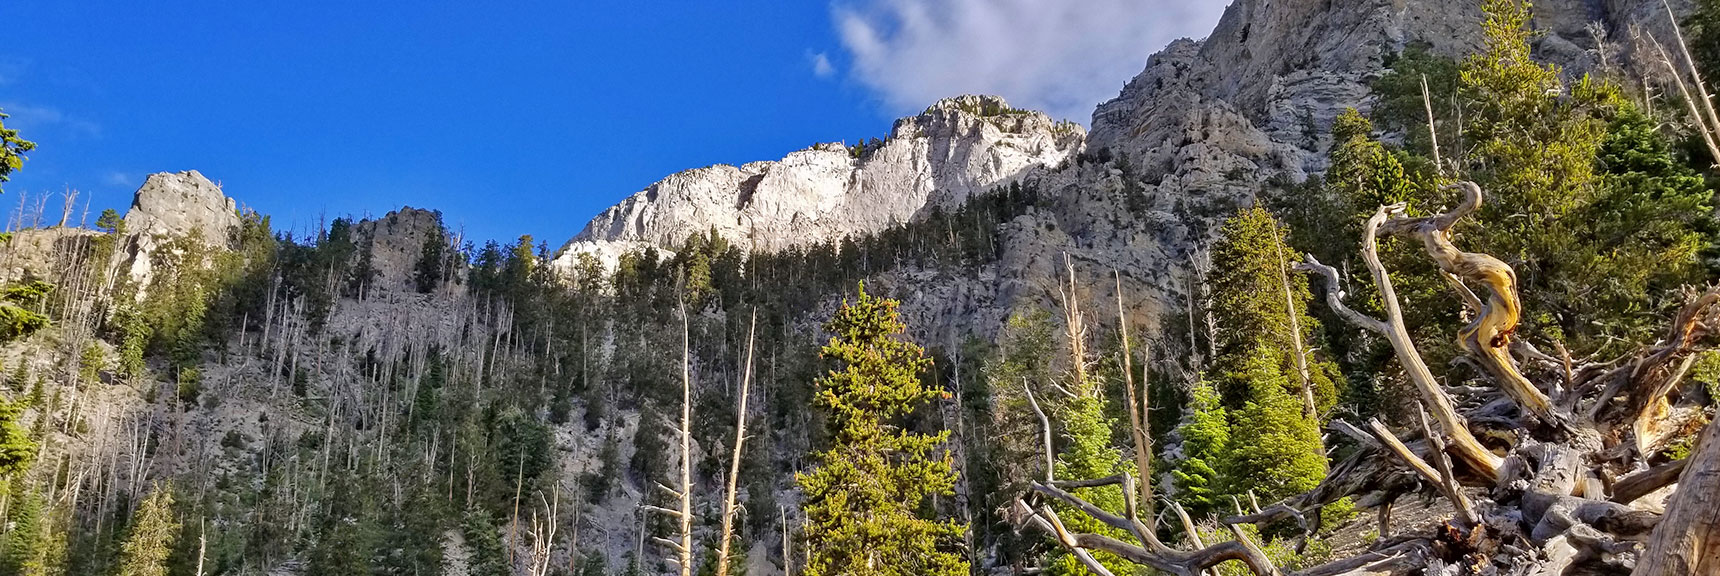 Mummy Mountain from North Loop Trail Approaching Raintree | Mummy Mountain's Knees | Mt. Charleston Wilderness, Nevada 005